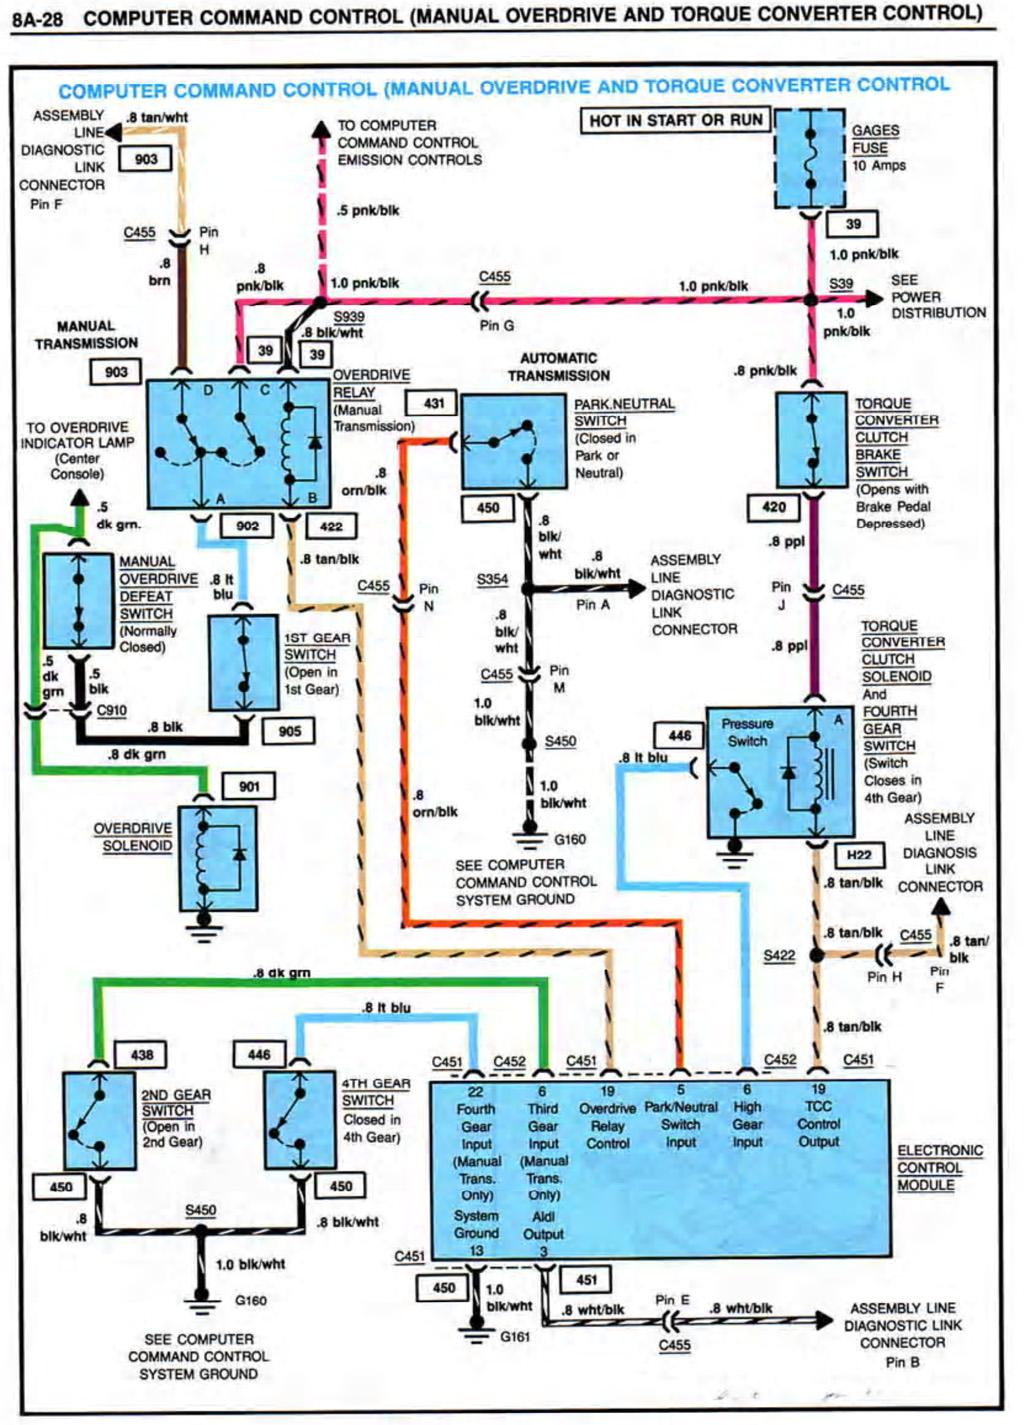 1985 corvette wiring diagram strat 7 way 85 for fuel pump get free image